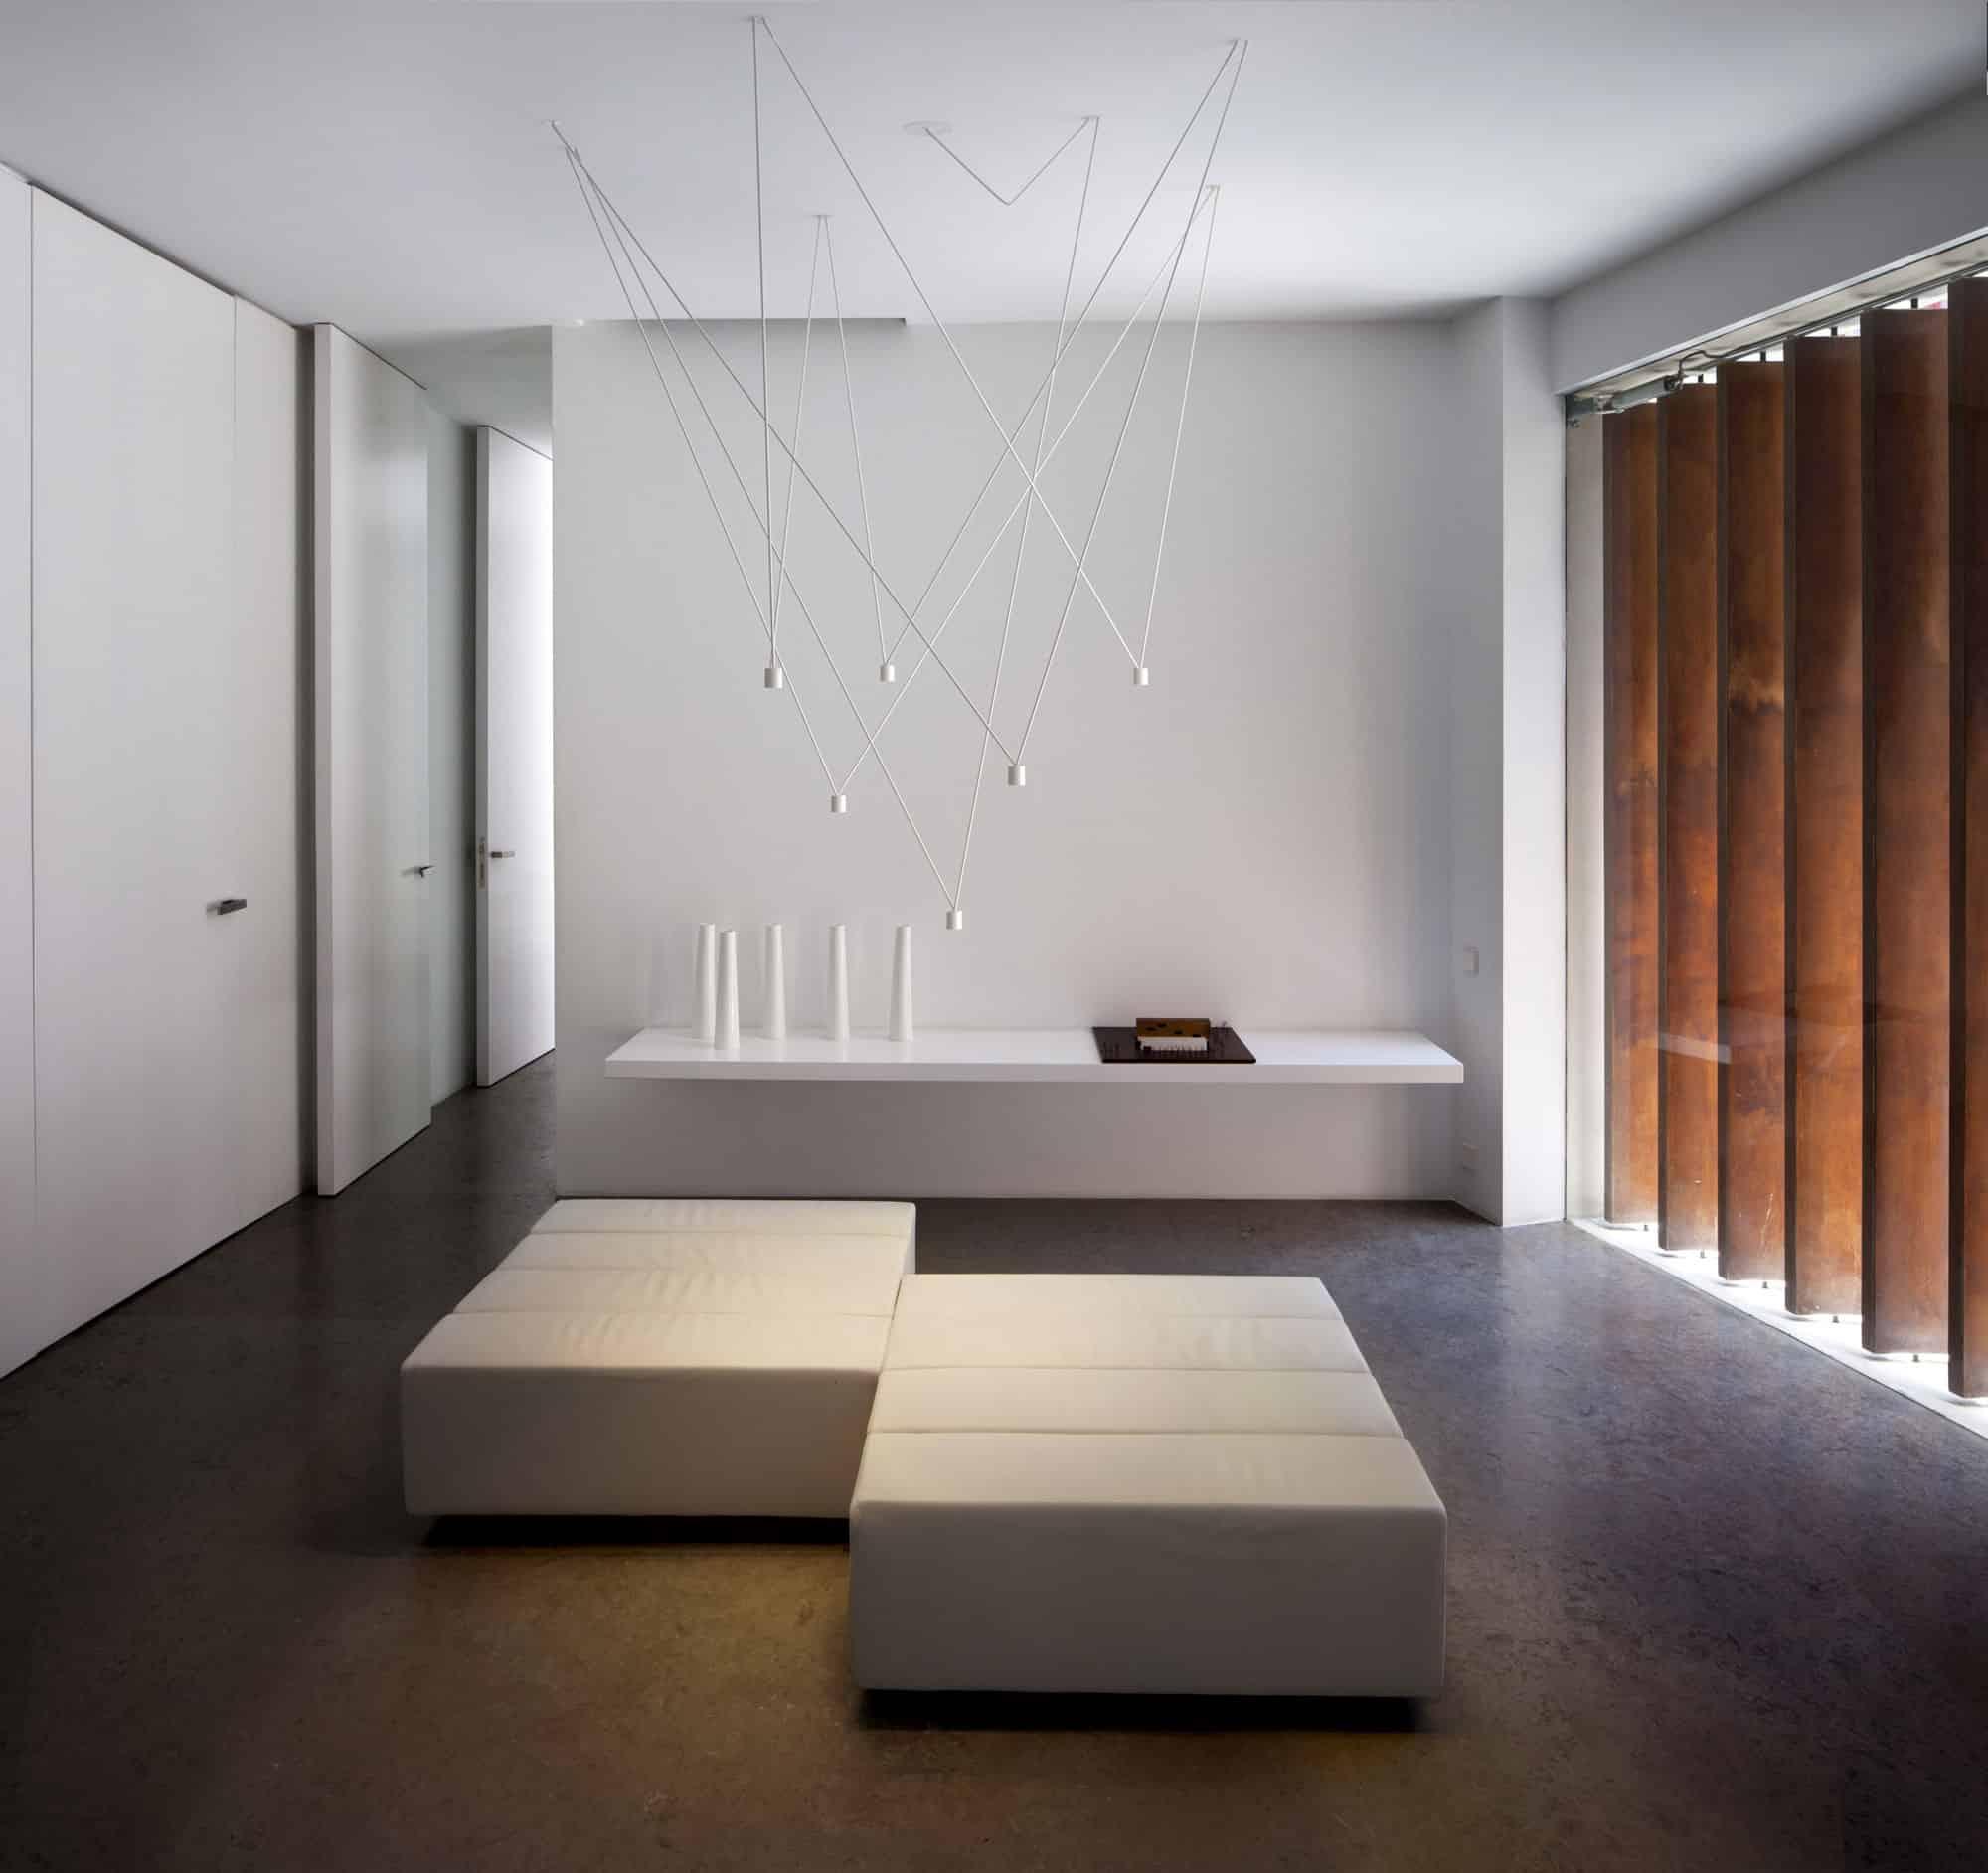 Home-Studio in El Carmen by Ramon Esteve Estudio